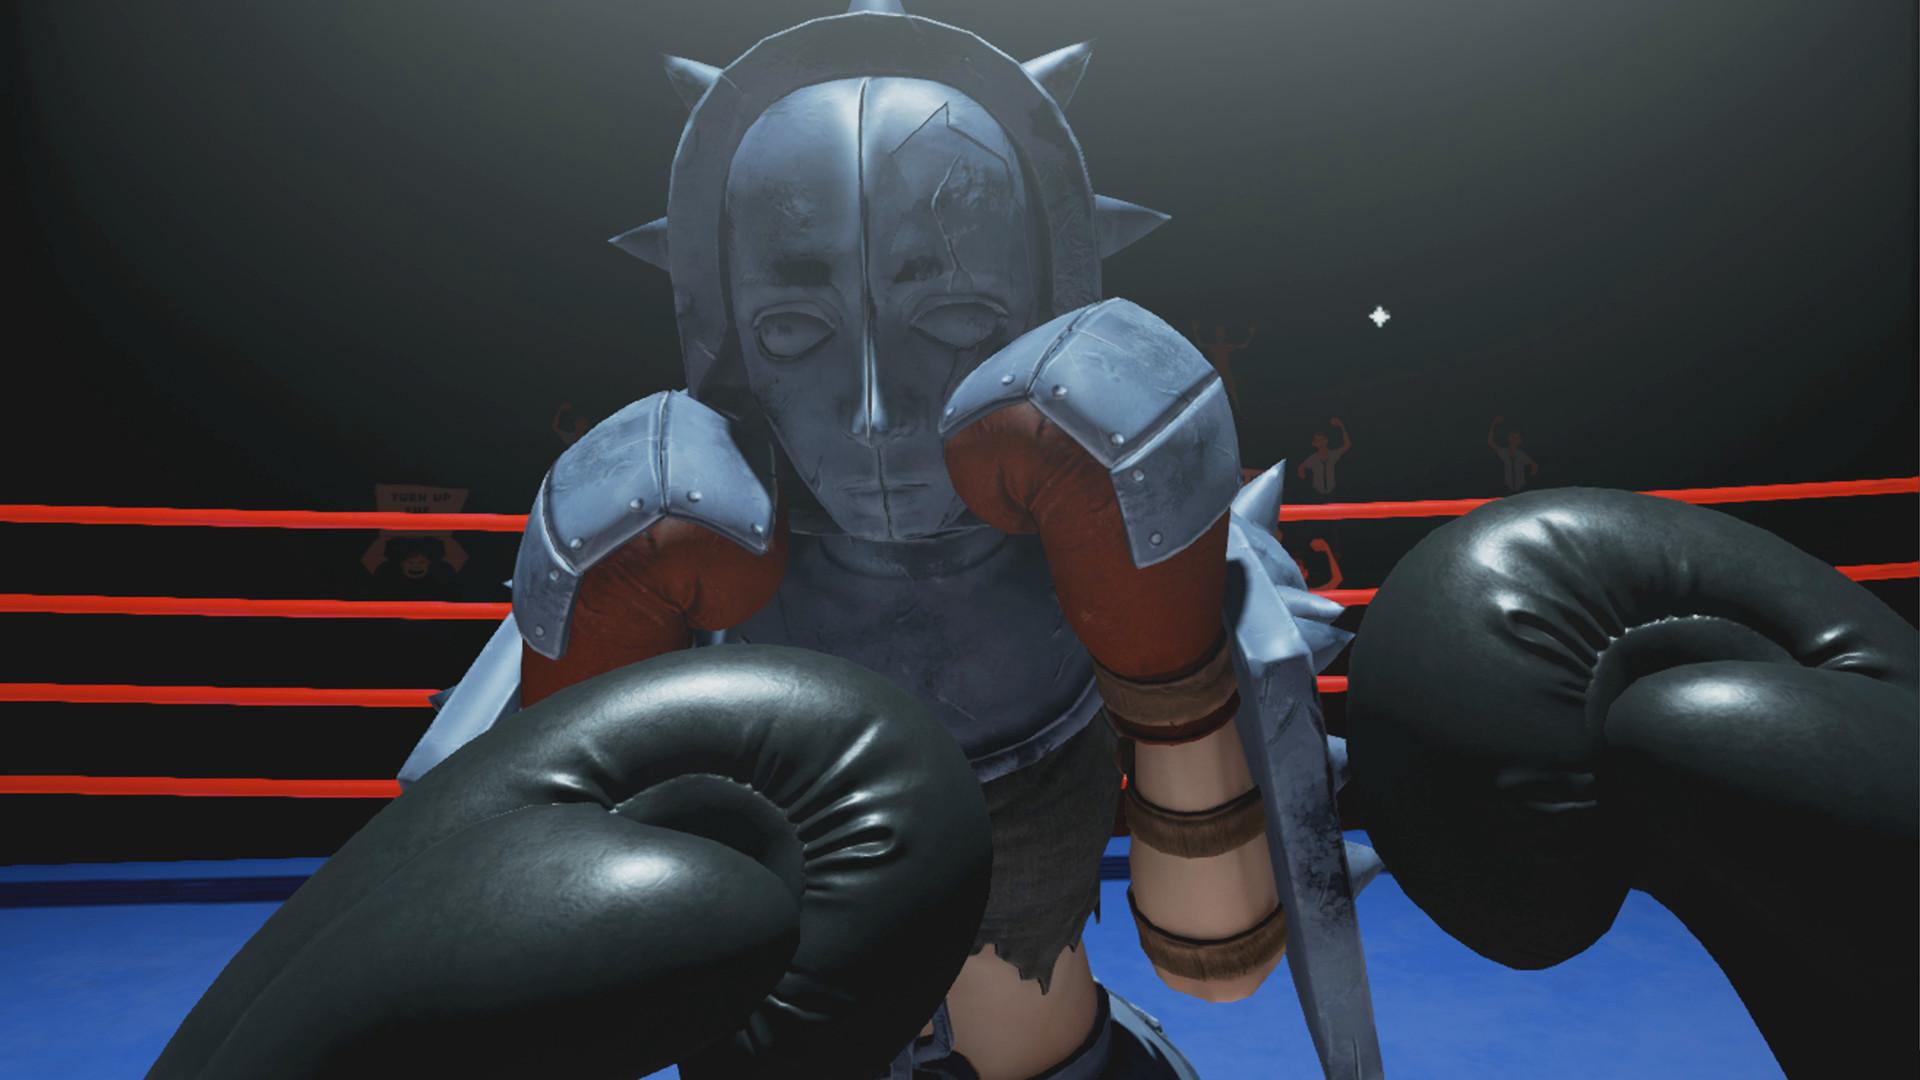 Knockout-League-Full-Release-Oculus-Rift-HTC-Vive-PSVR